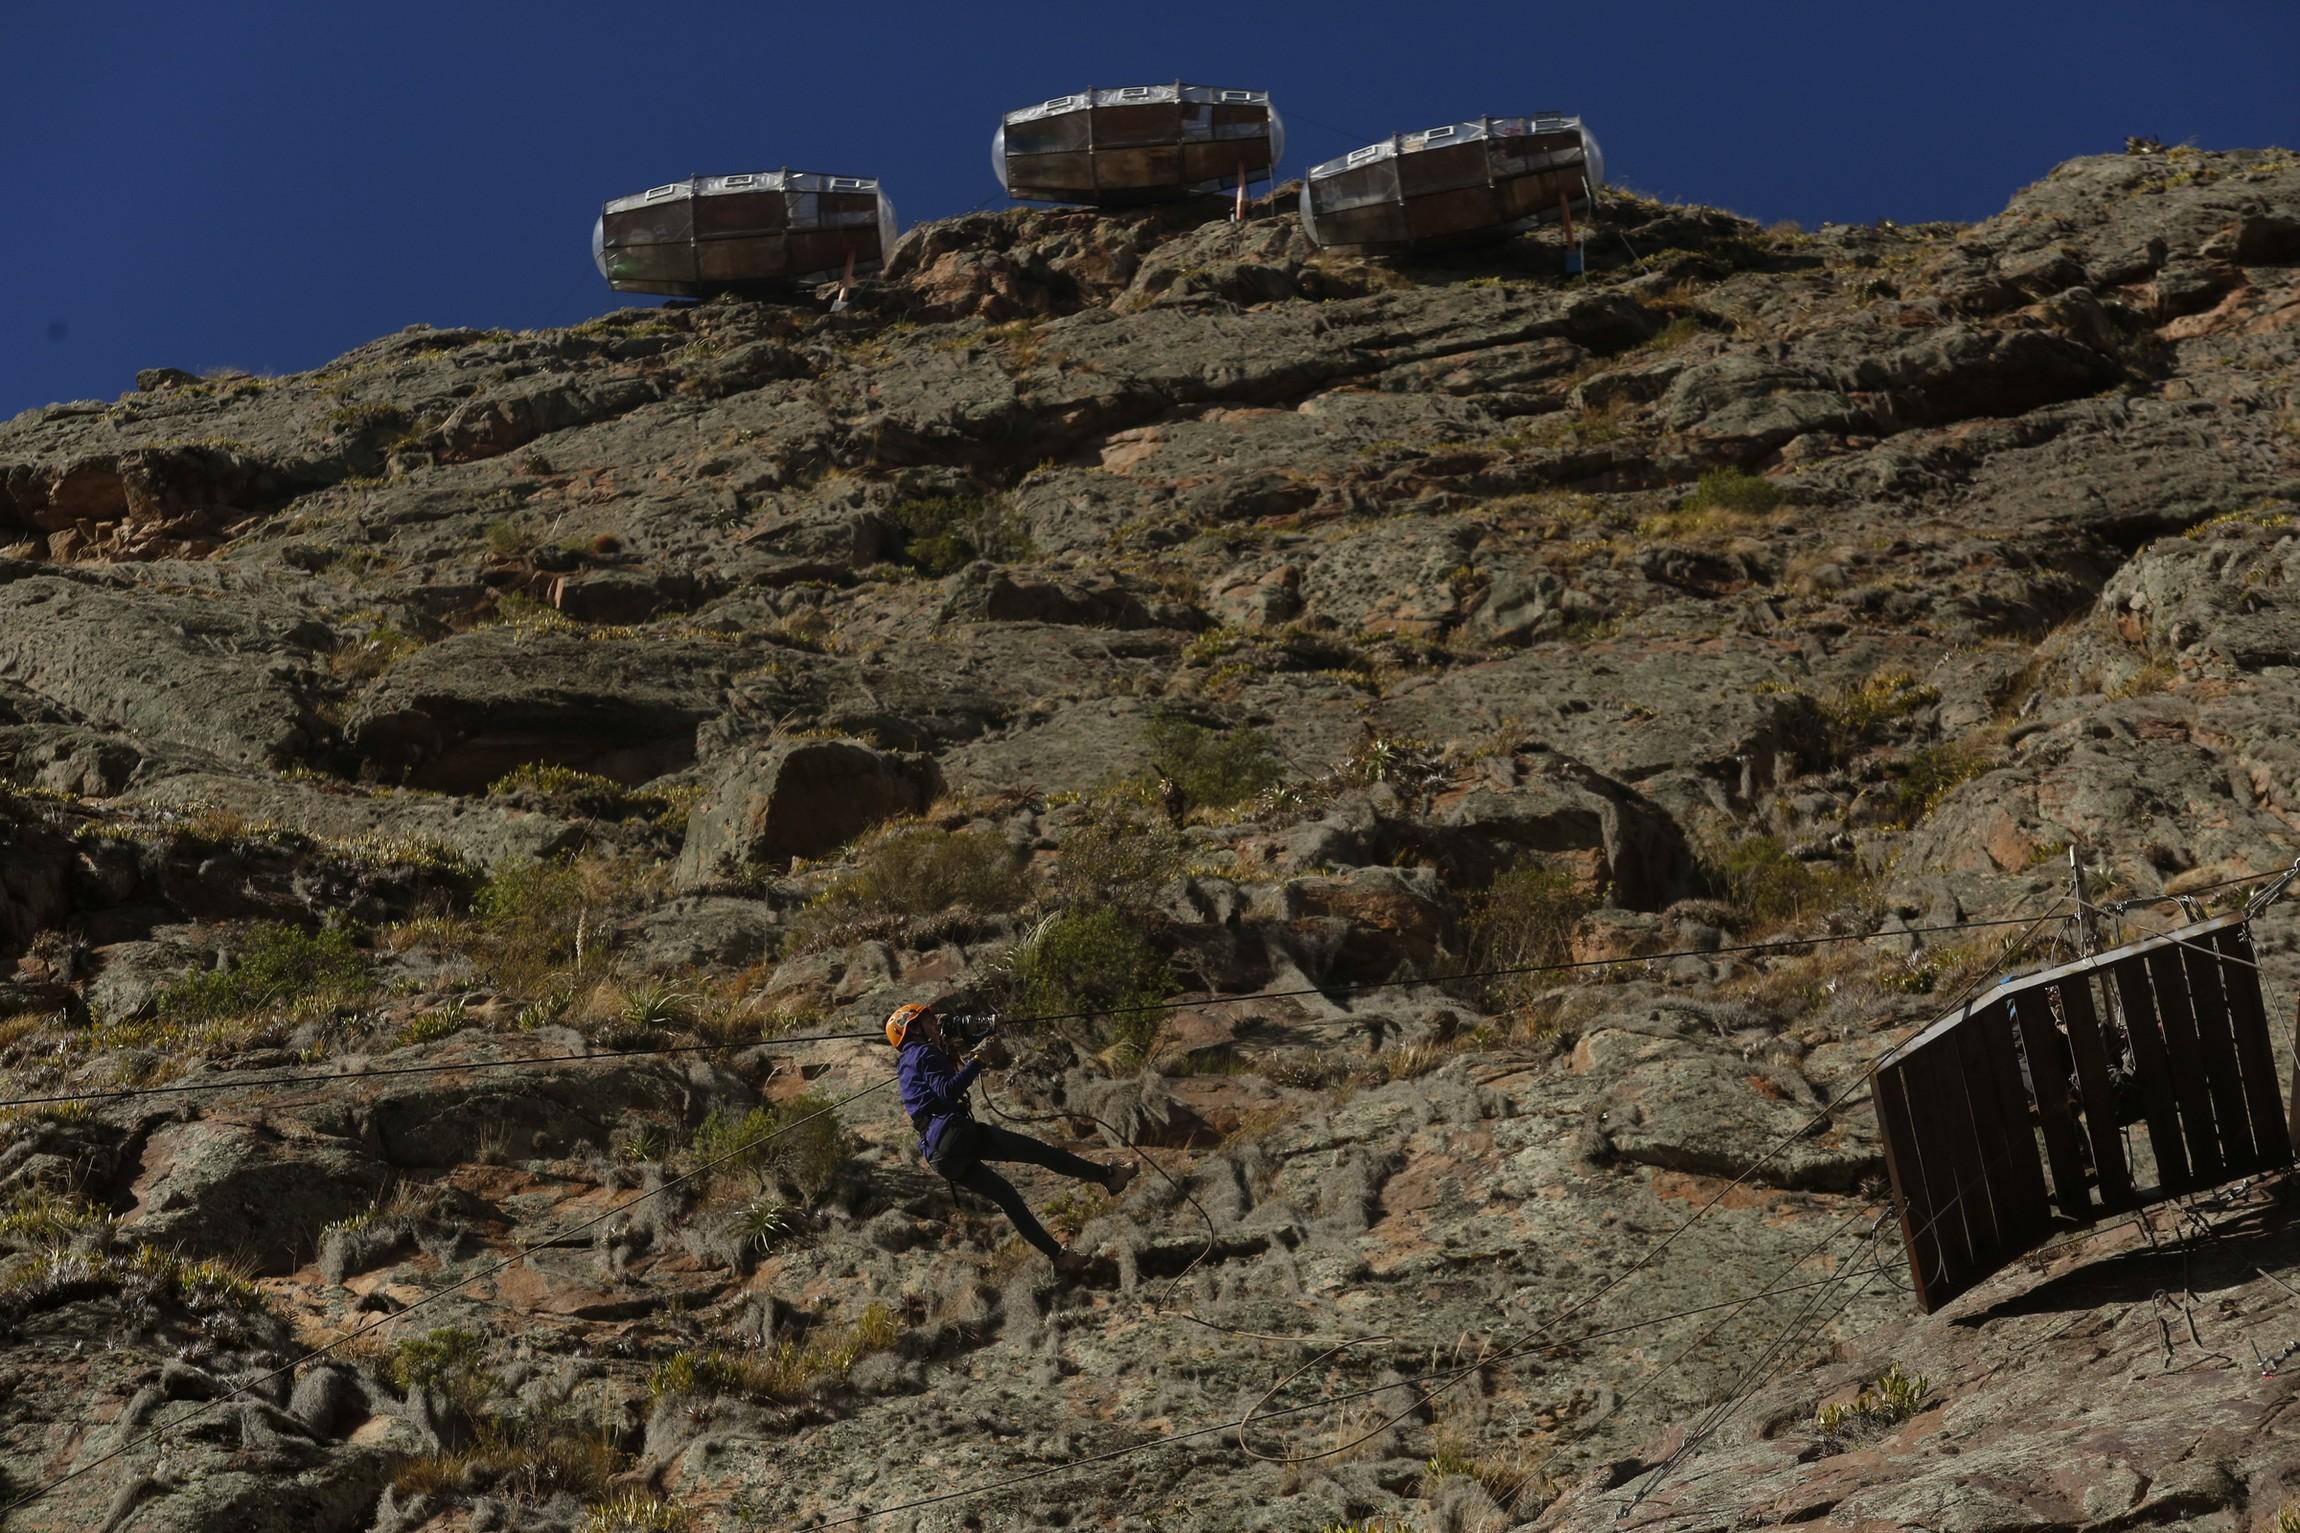 Skylodge Adventure Suites Natura Vive Archello